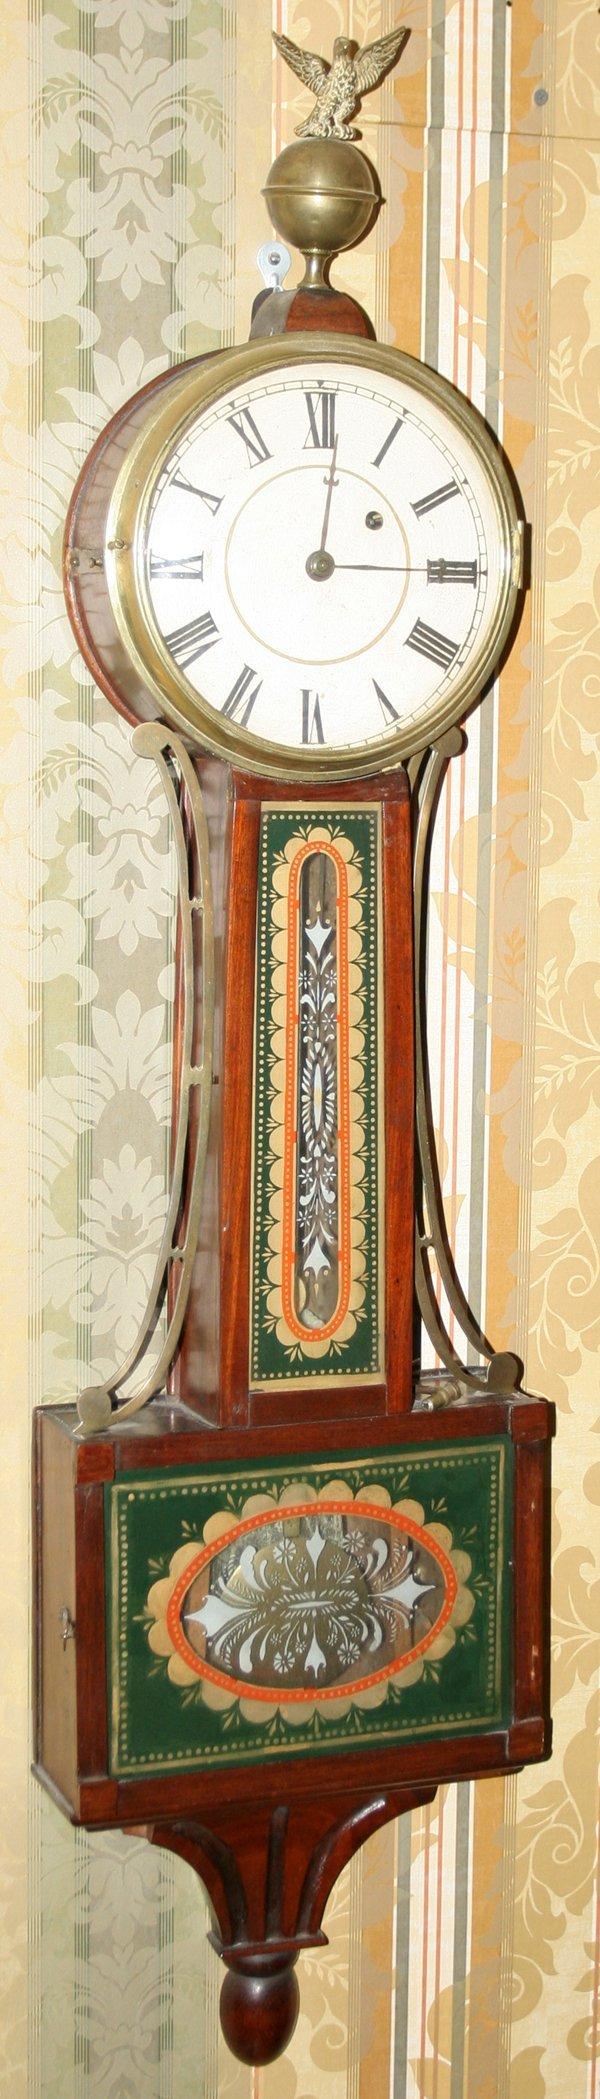 021015: AMERICAN FEDERAL MAHOGANY BANJO CLOCK, C. 1810